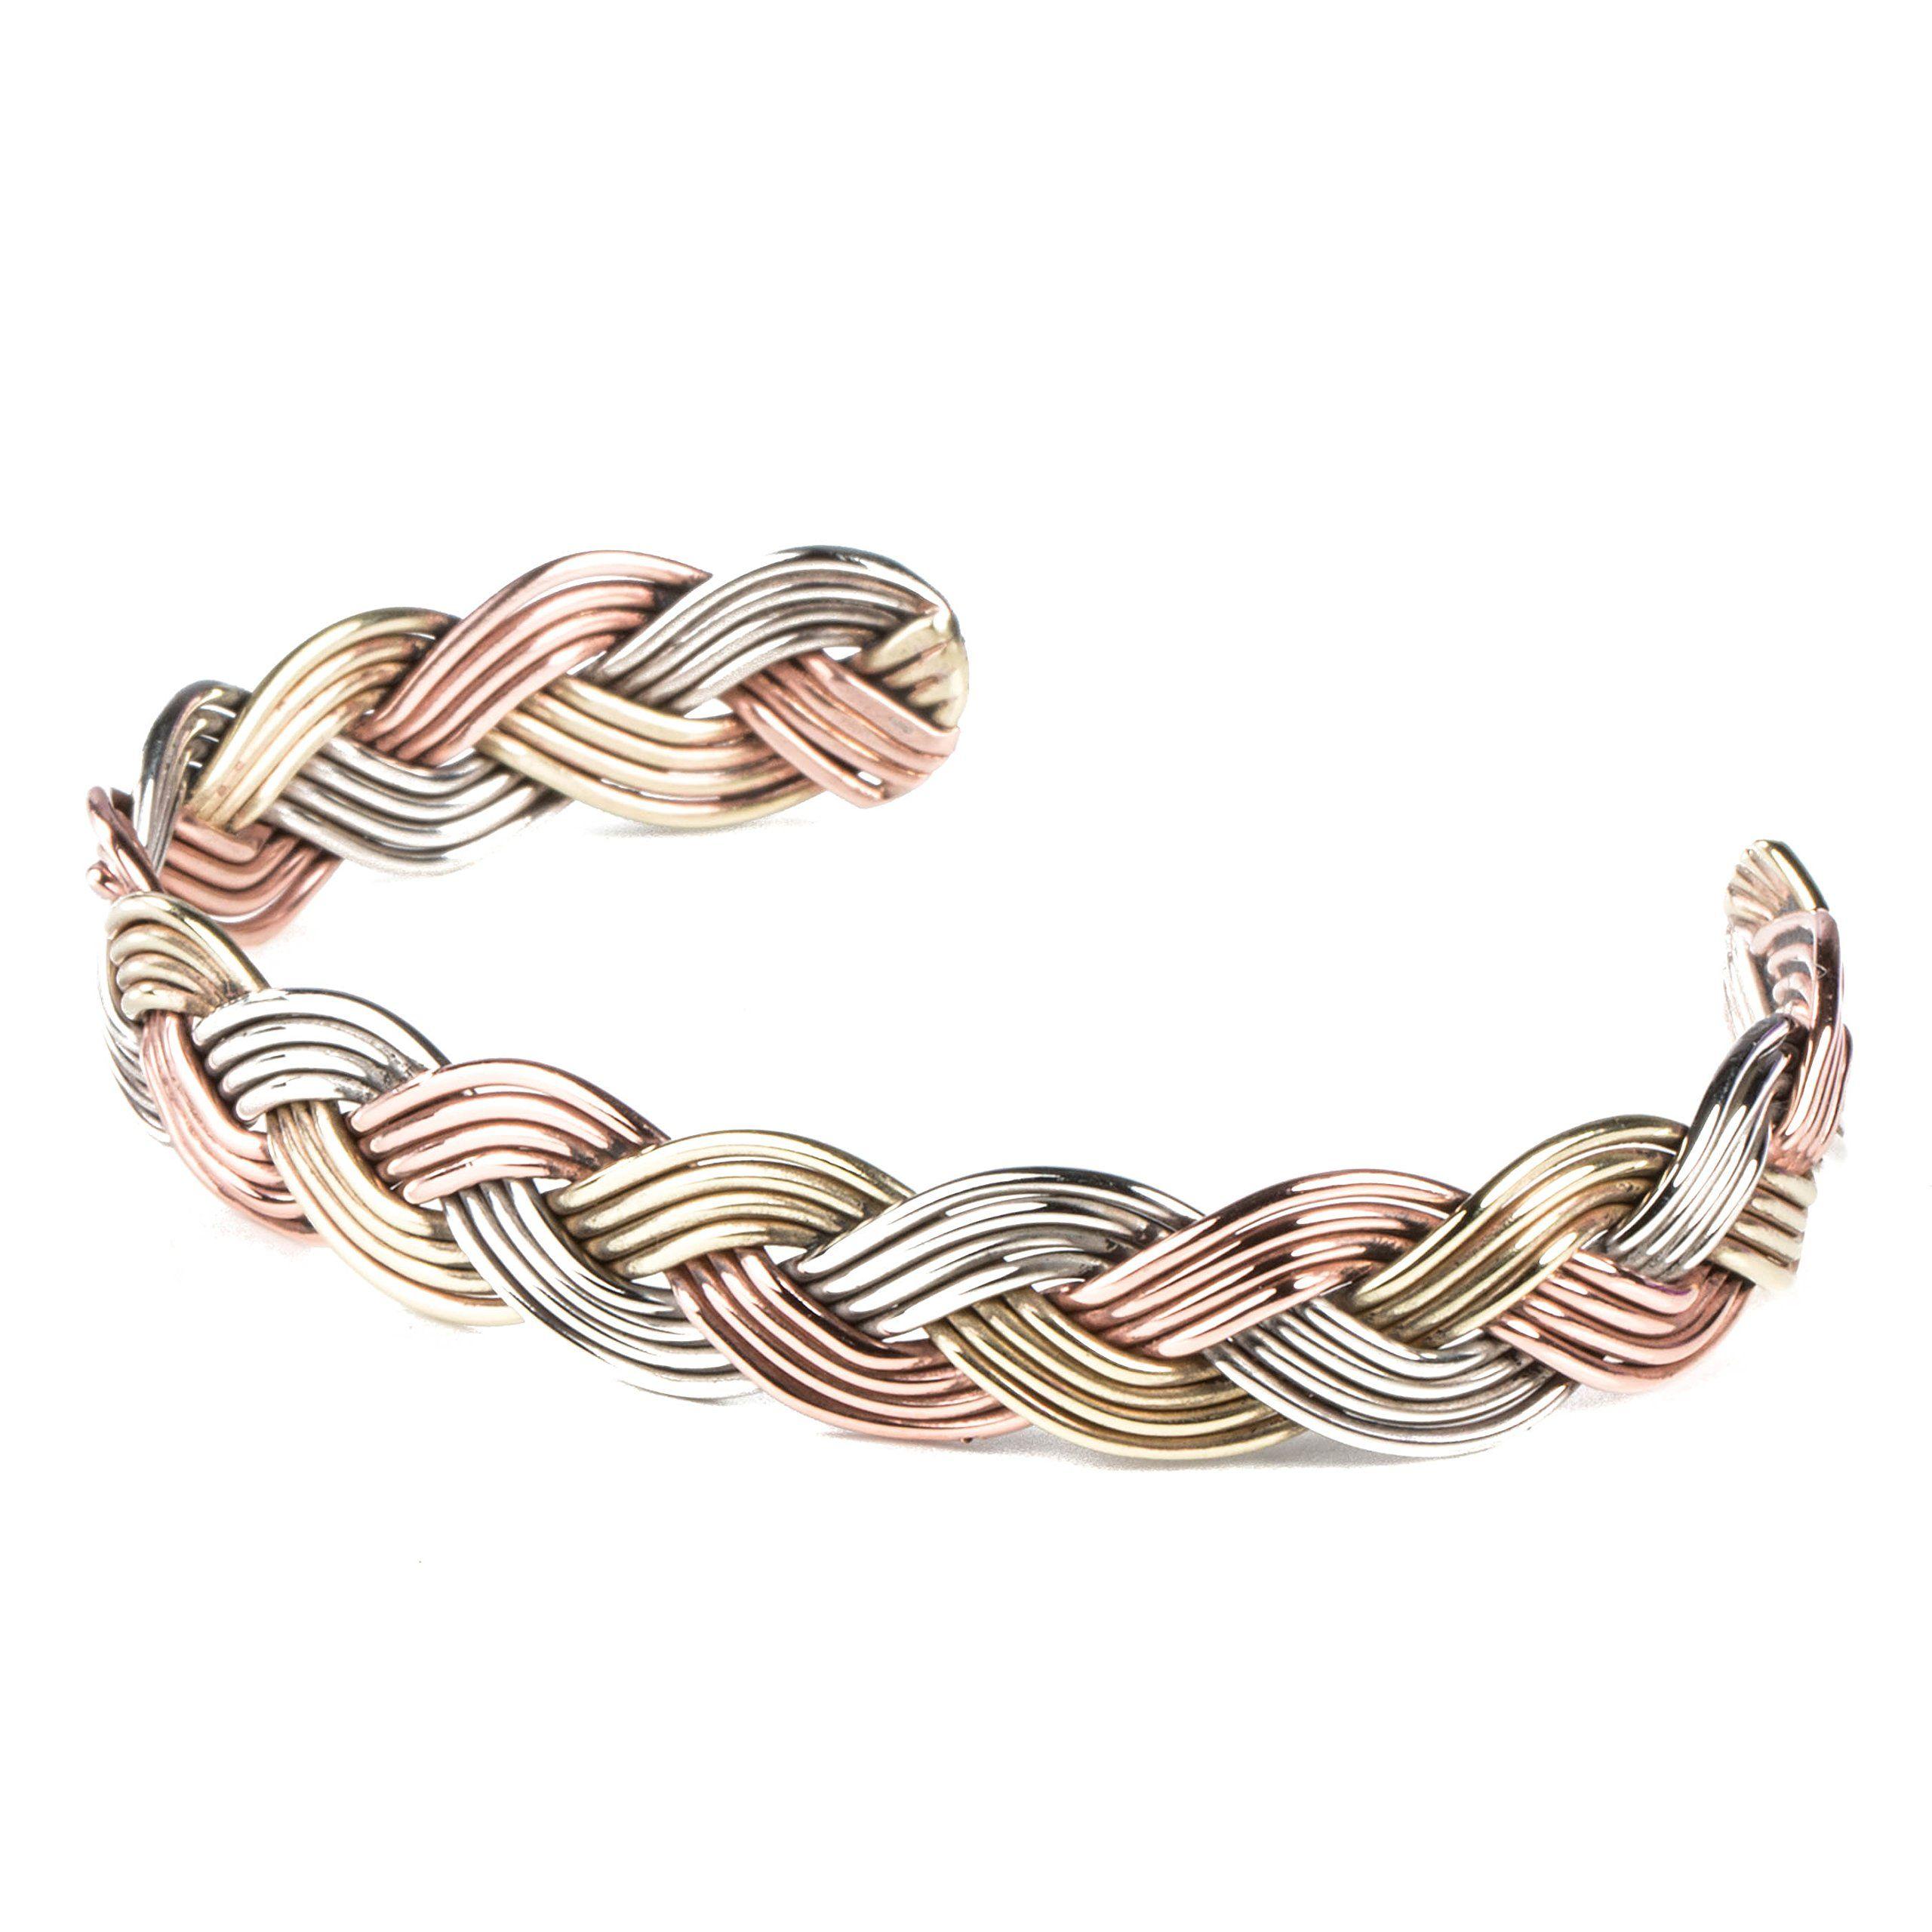 TSKIES Authentic Navajo Woven Rope Wire Copper Nickel Brass Bracelet ...